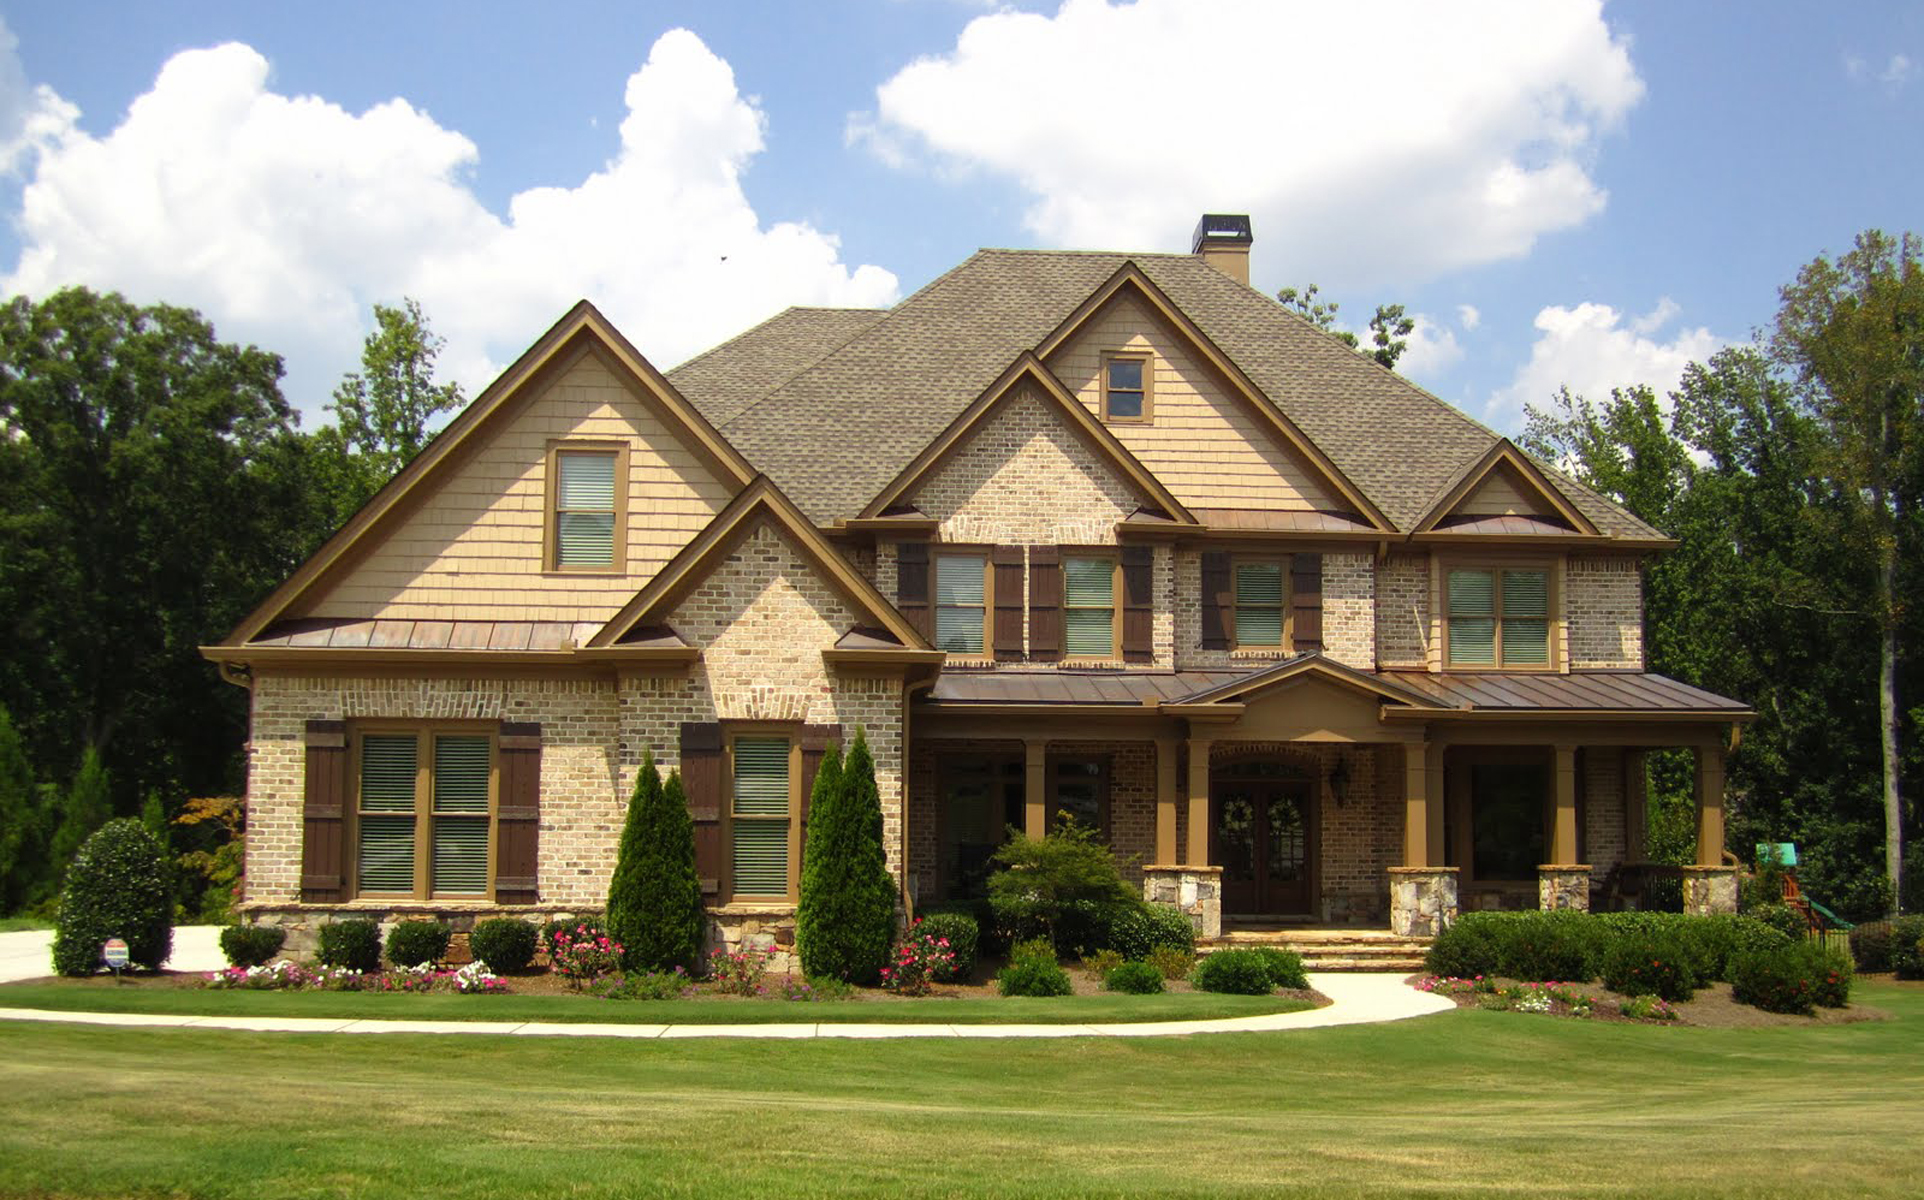 <small>Планируете свой дом?</small><small>готовые дома и коттеджи</small>